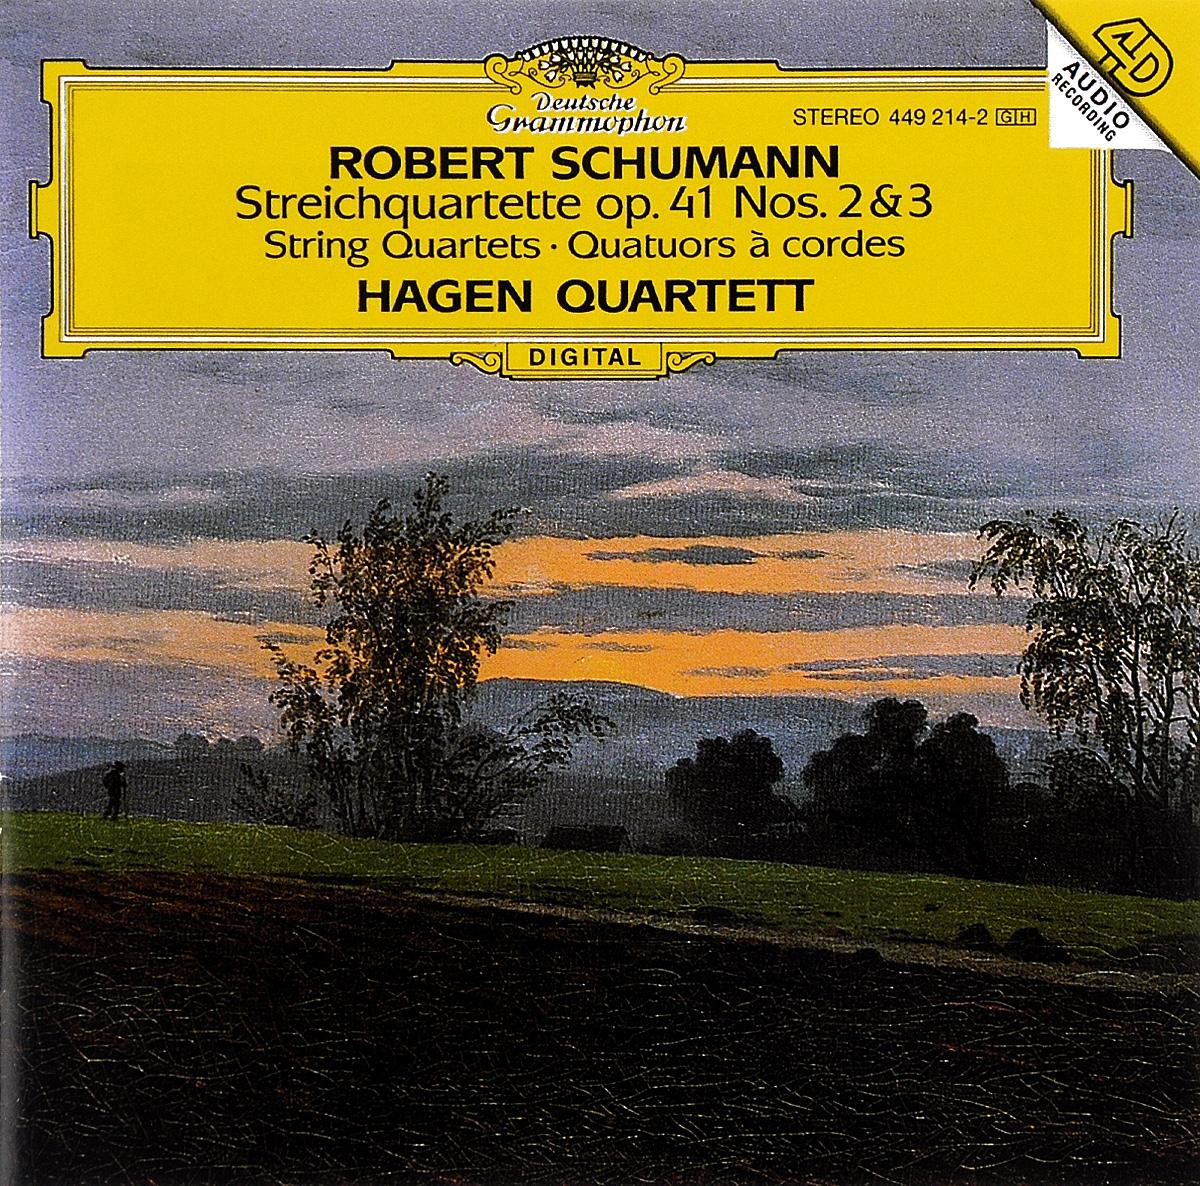 Hagen Quartett Hagen Quartett. Schumann. Streichquartette Op. 41 Nos. 2 & 3 farid hagen